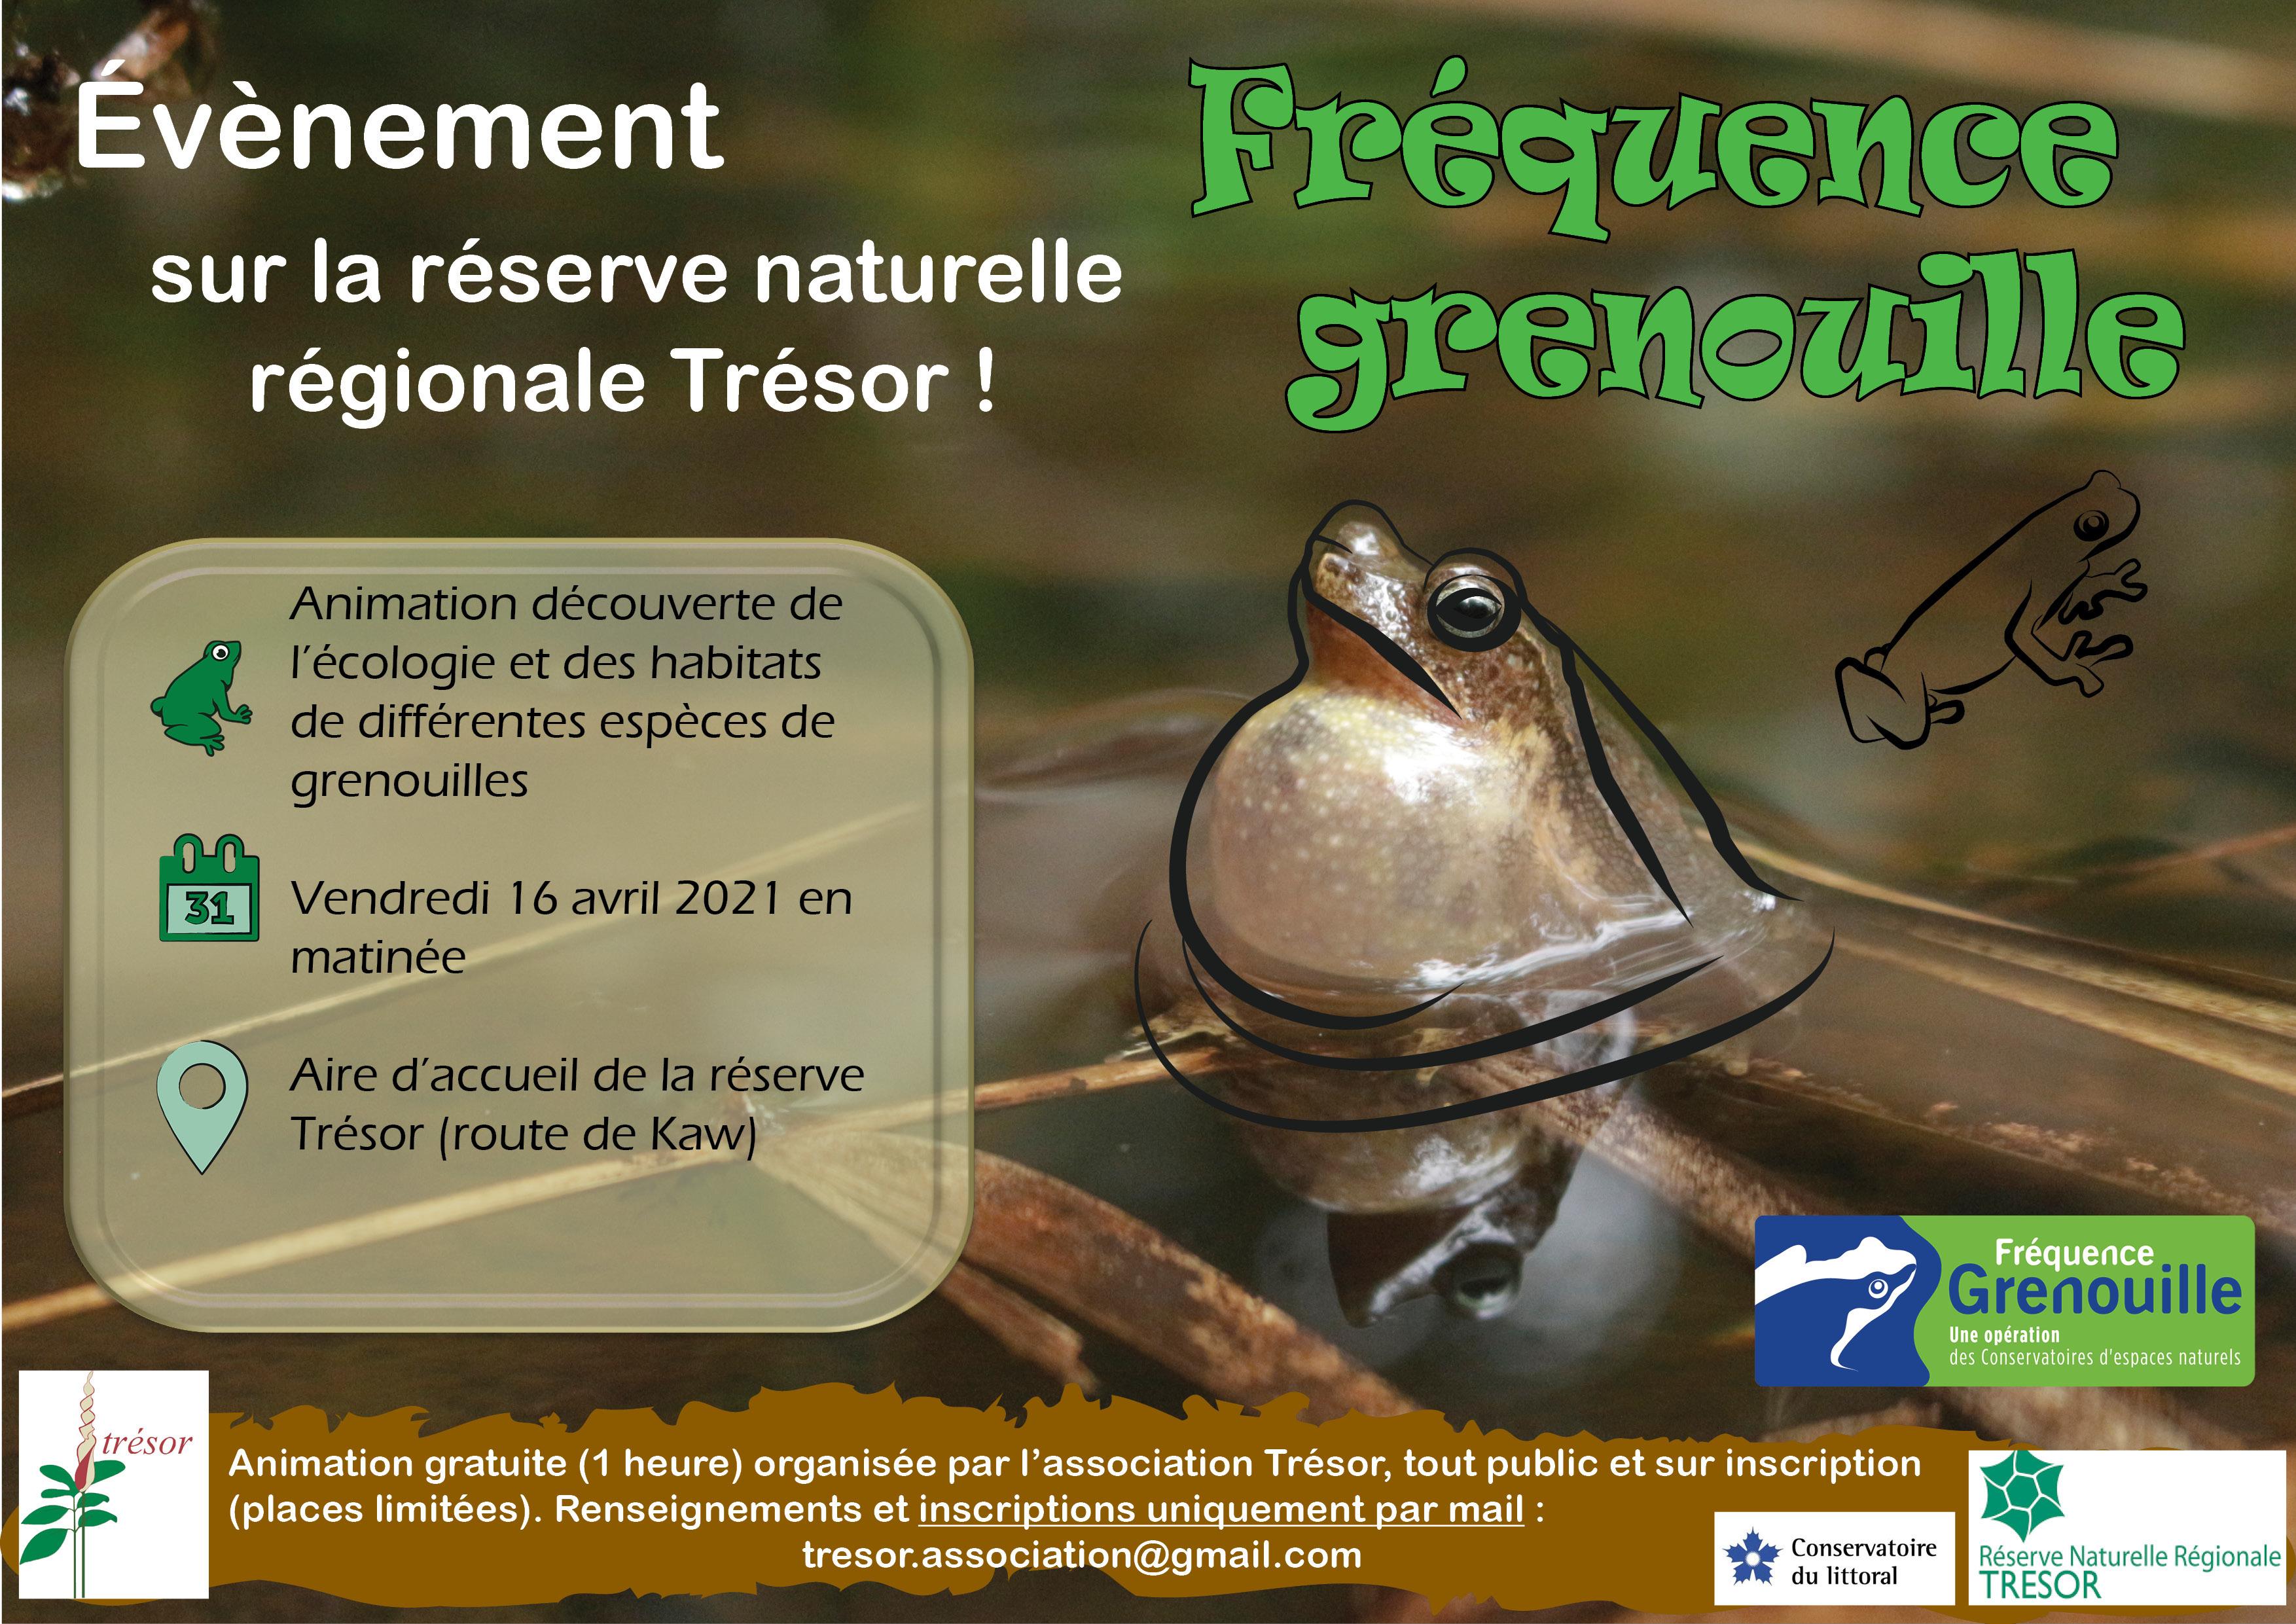 https://cdnfiles1.biolovision.net/www.faune-guyane.fr/userfiles/Documentsdivers/Amphibiens/FrquencegrenouilleRNRTrsor160421.jpg